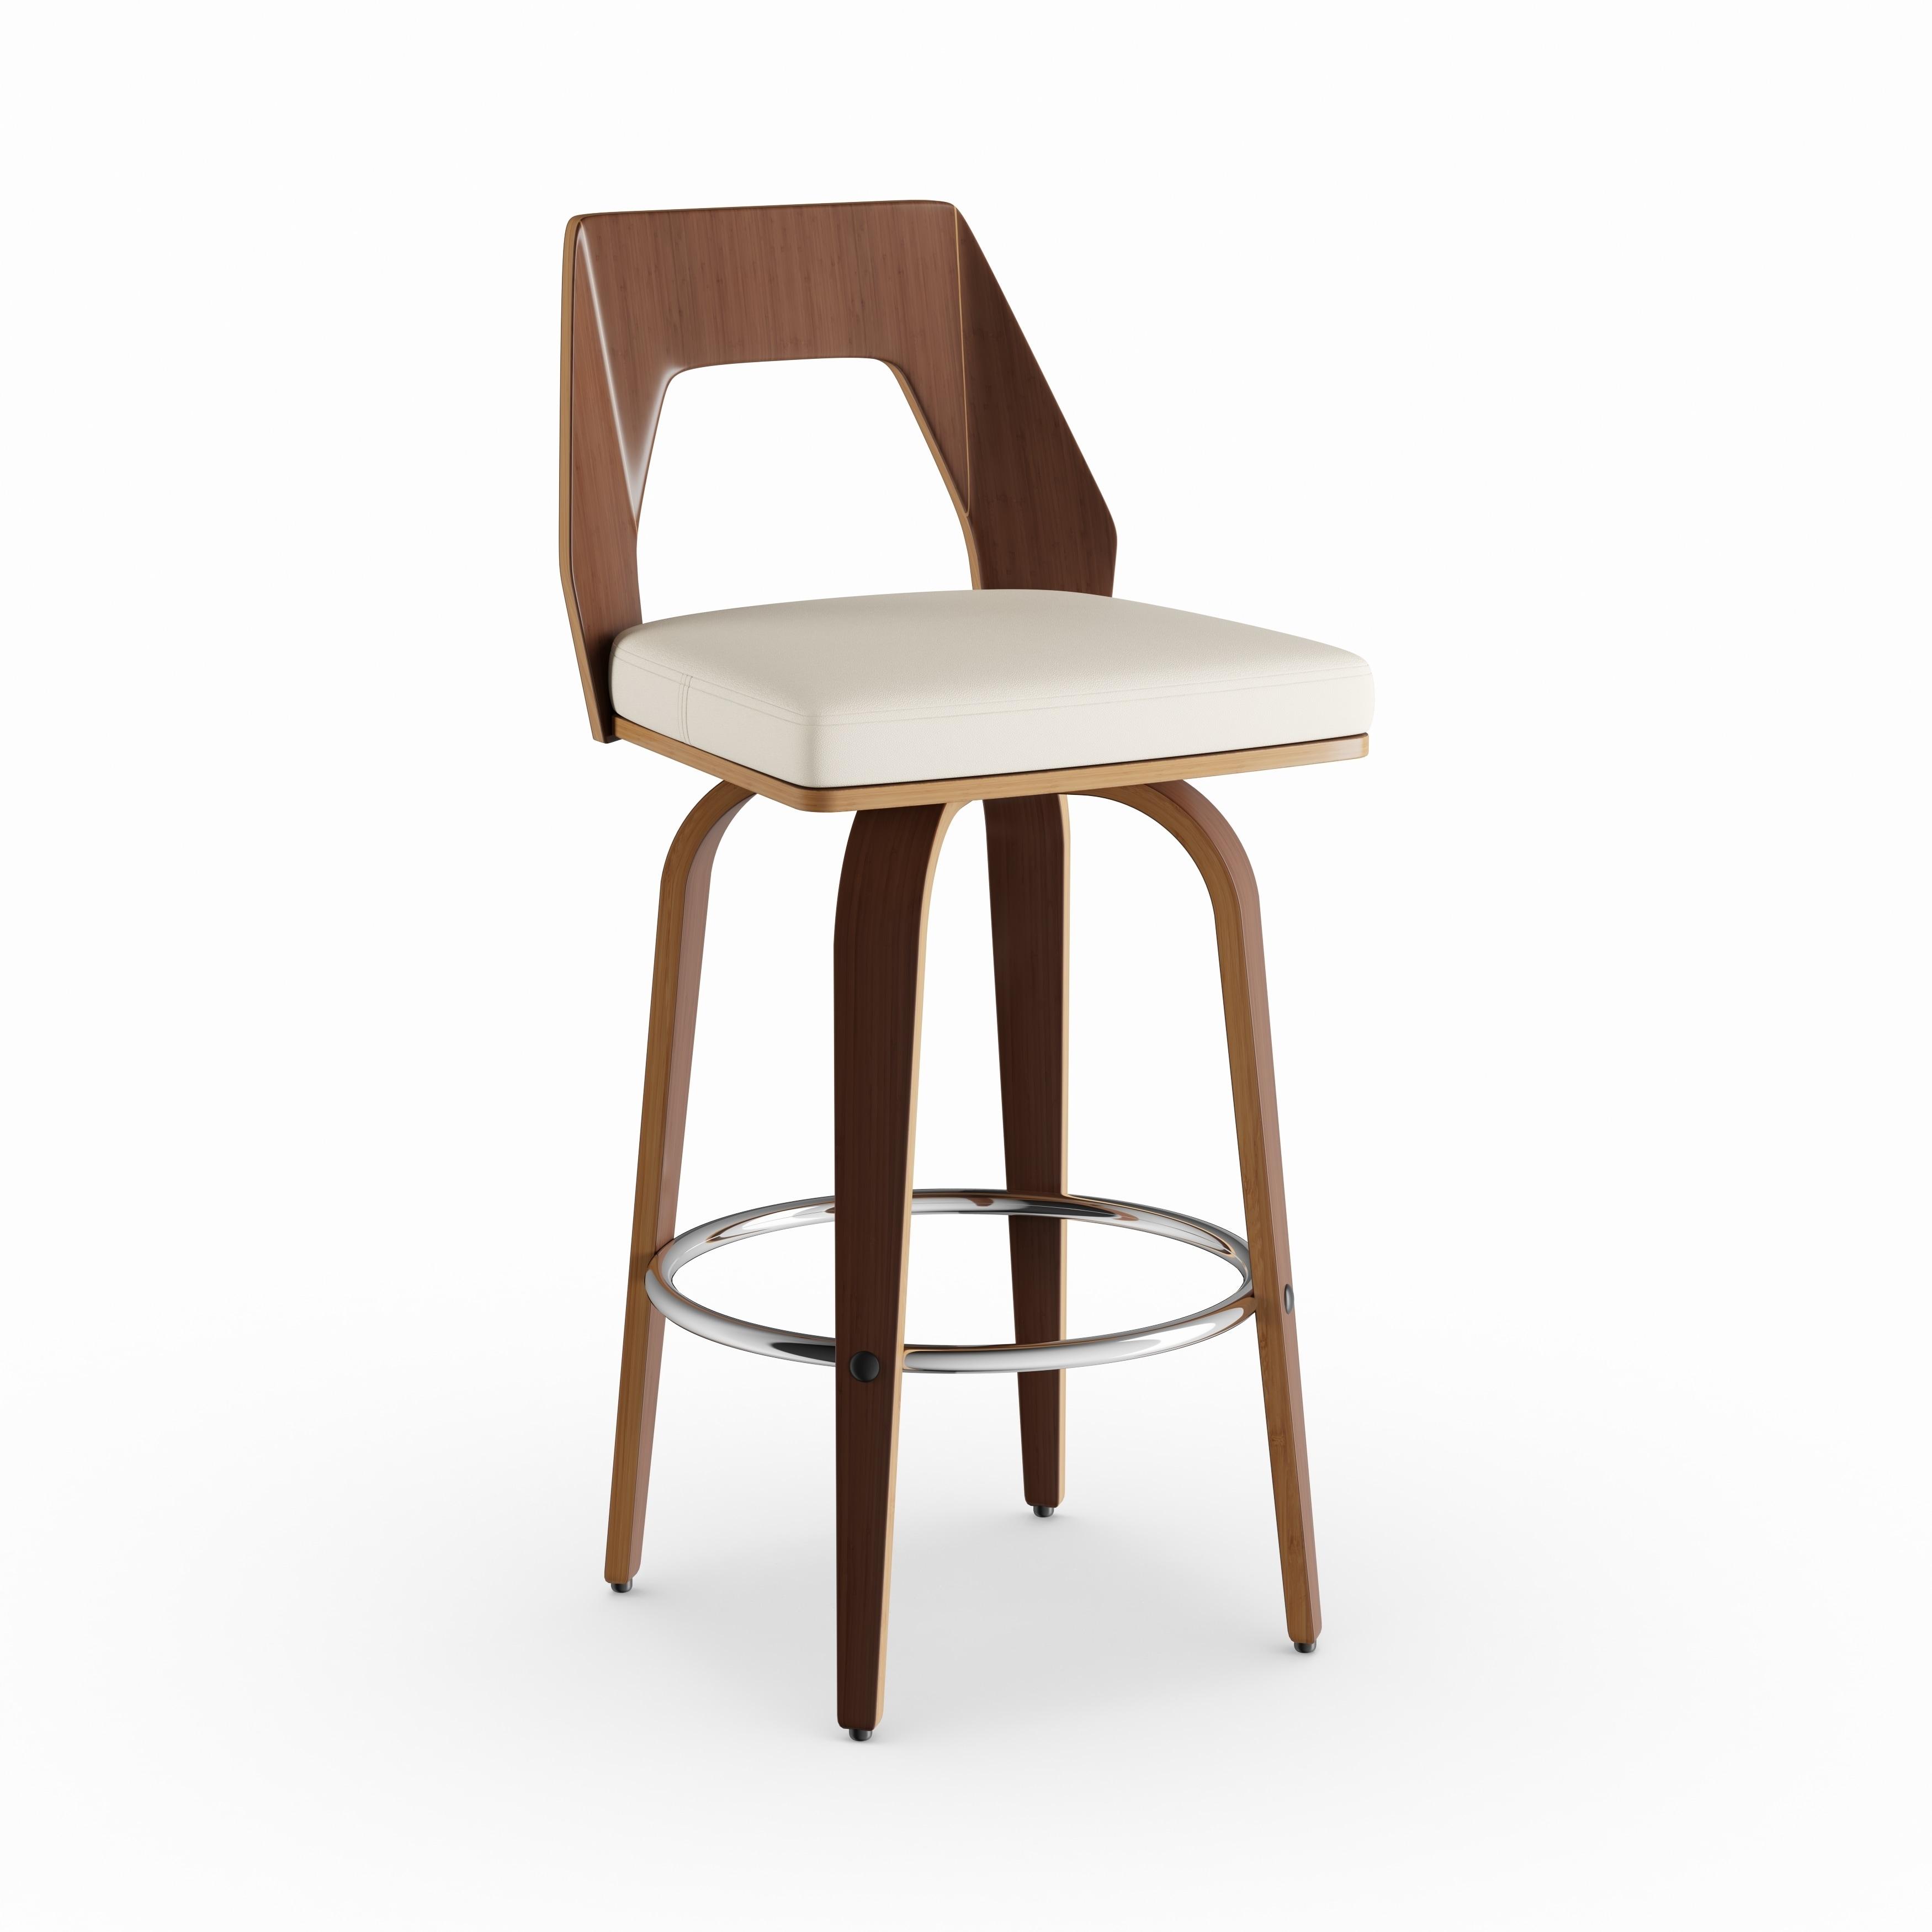 Shop strick bolton ross mid century modern walnut wood swivel bar stool on sale free shipping today overstock com 20170744